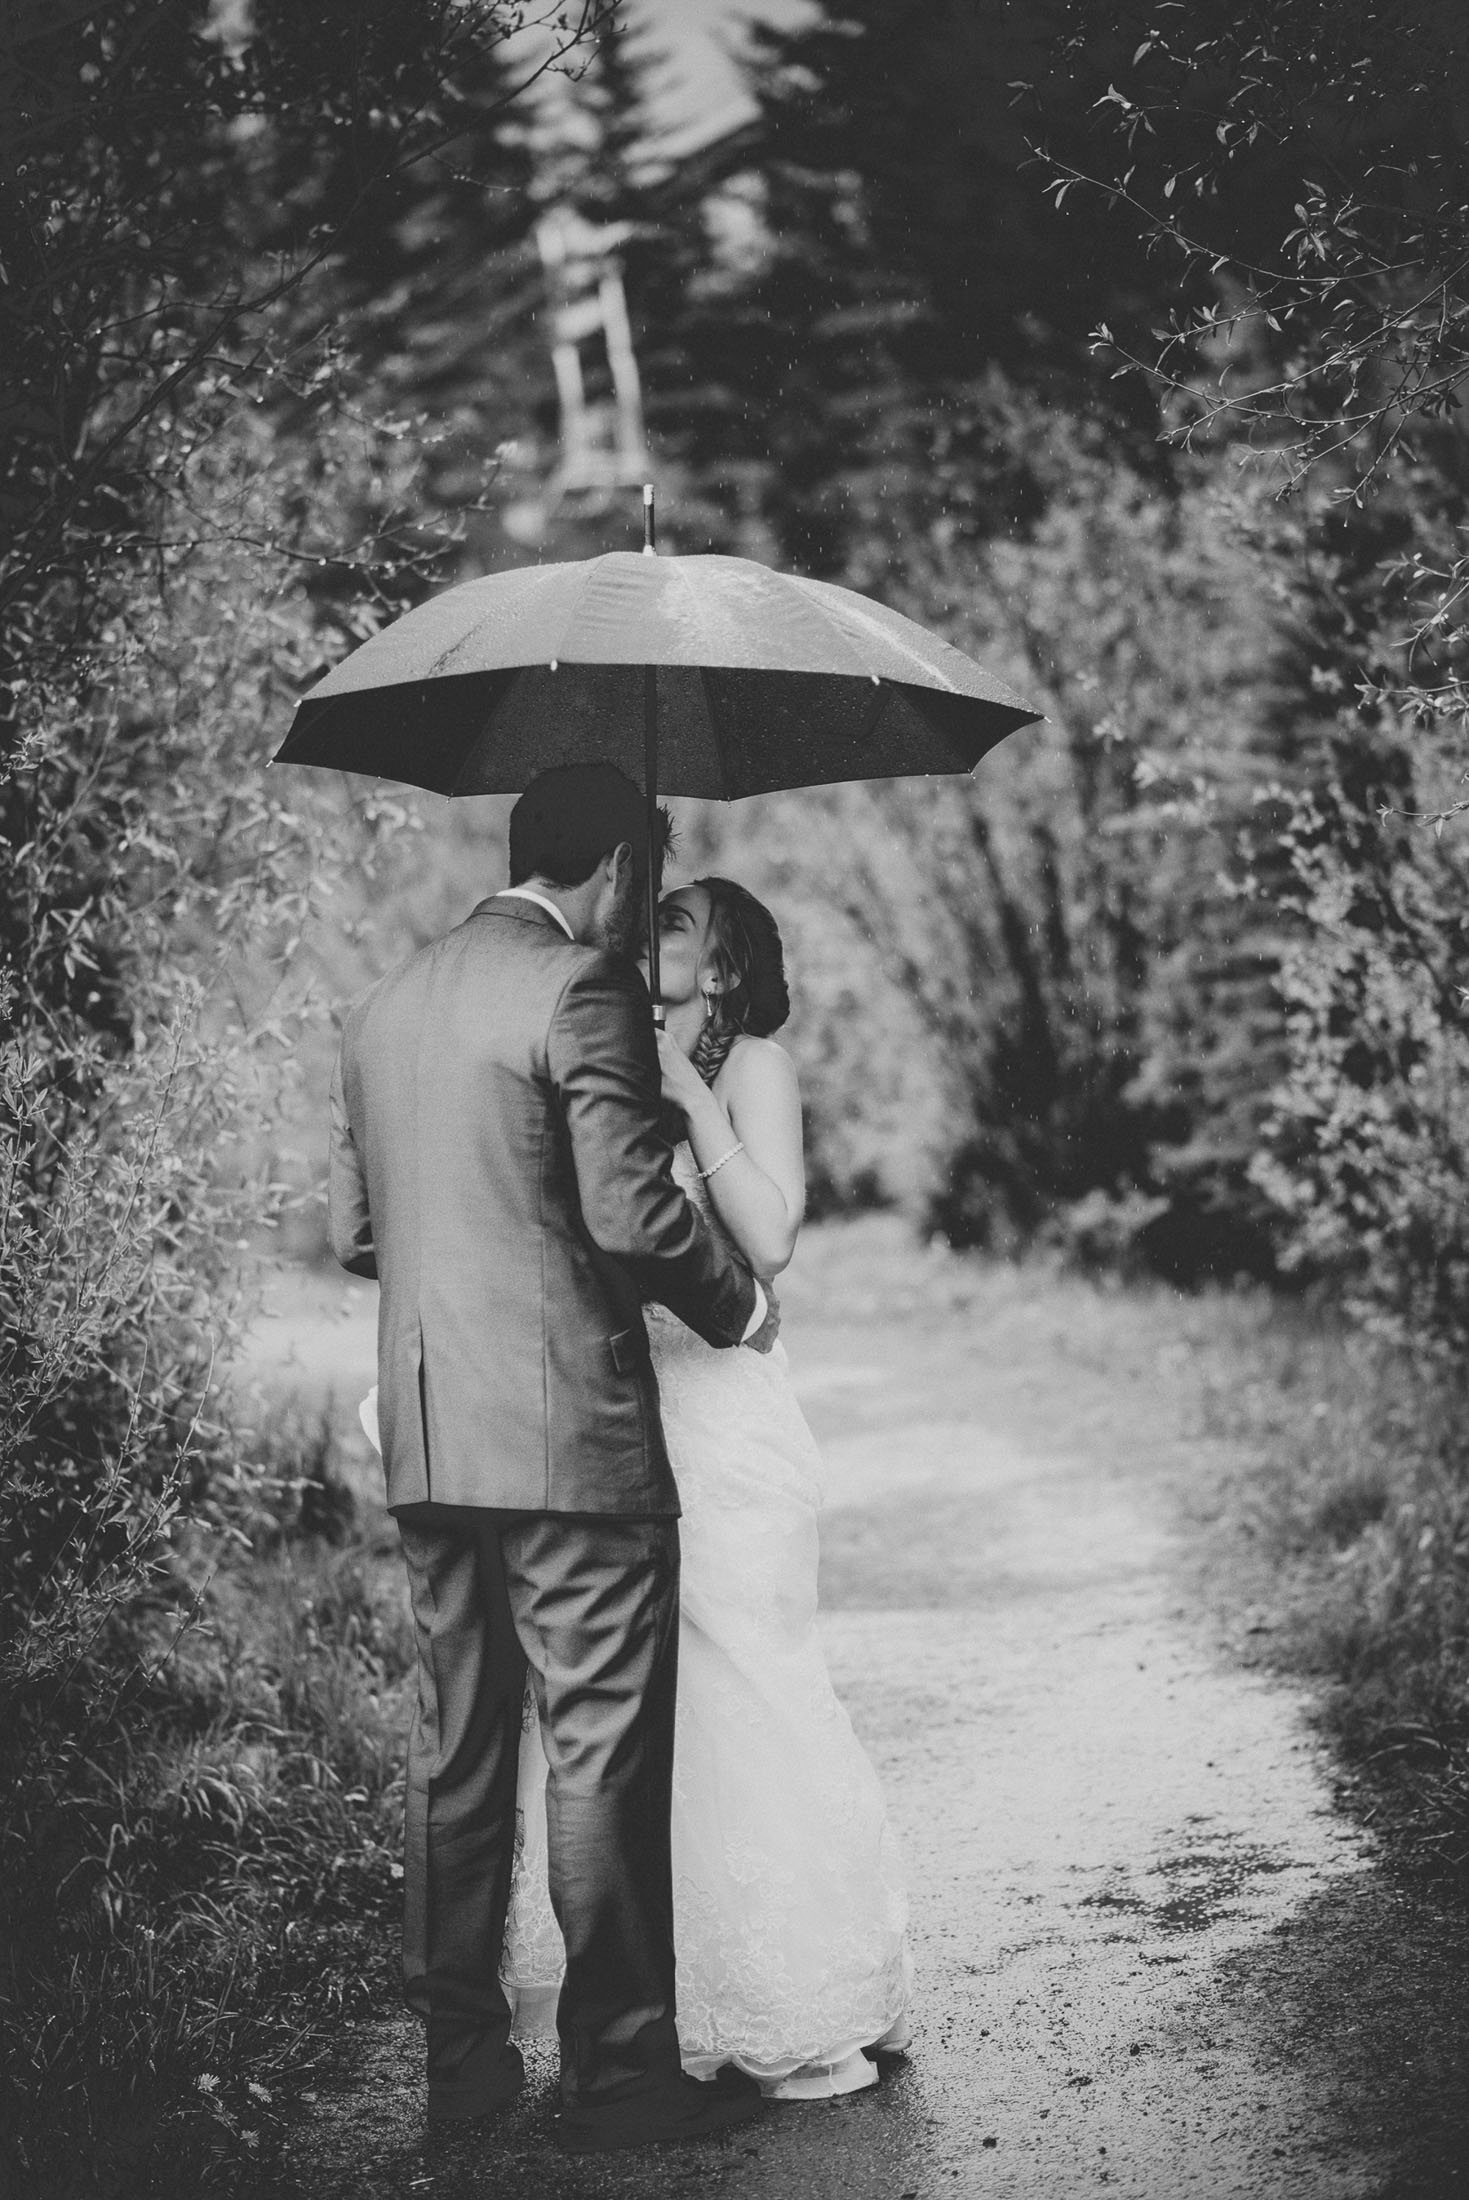 125elopement-photographer-colorado-telluride_wedding_photographer_colorado_mountain_wedding_photographer_brie&tyler_0709_vintage_black_and_white_film.jpg